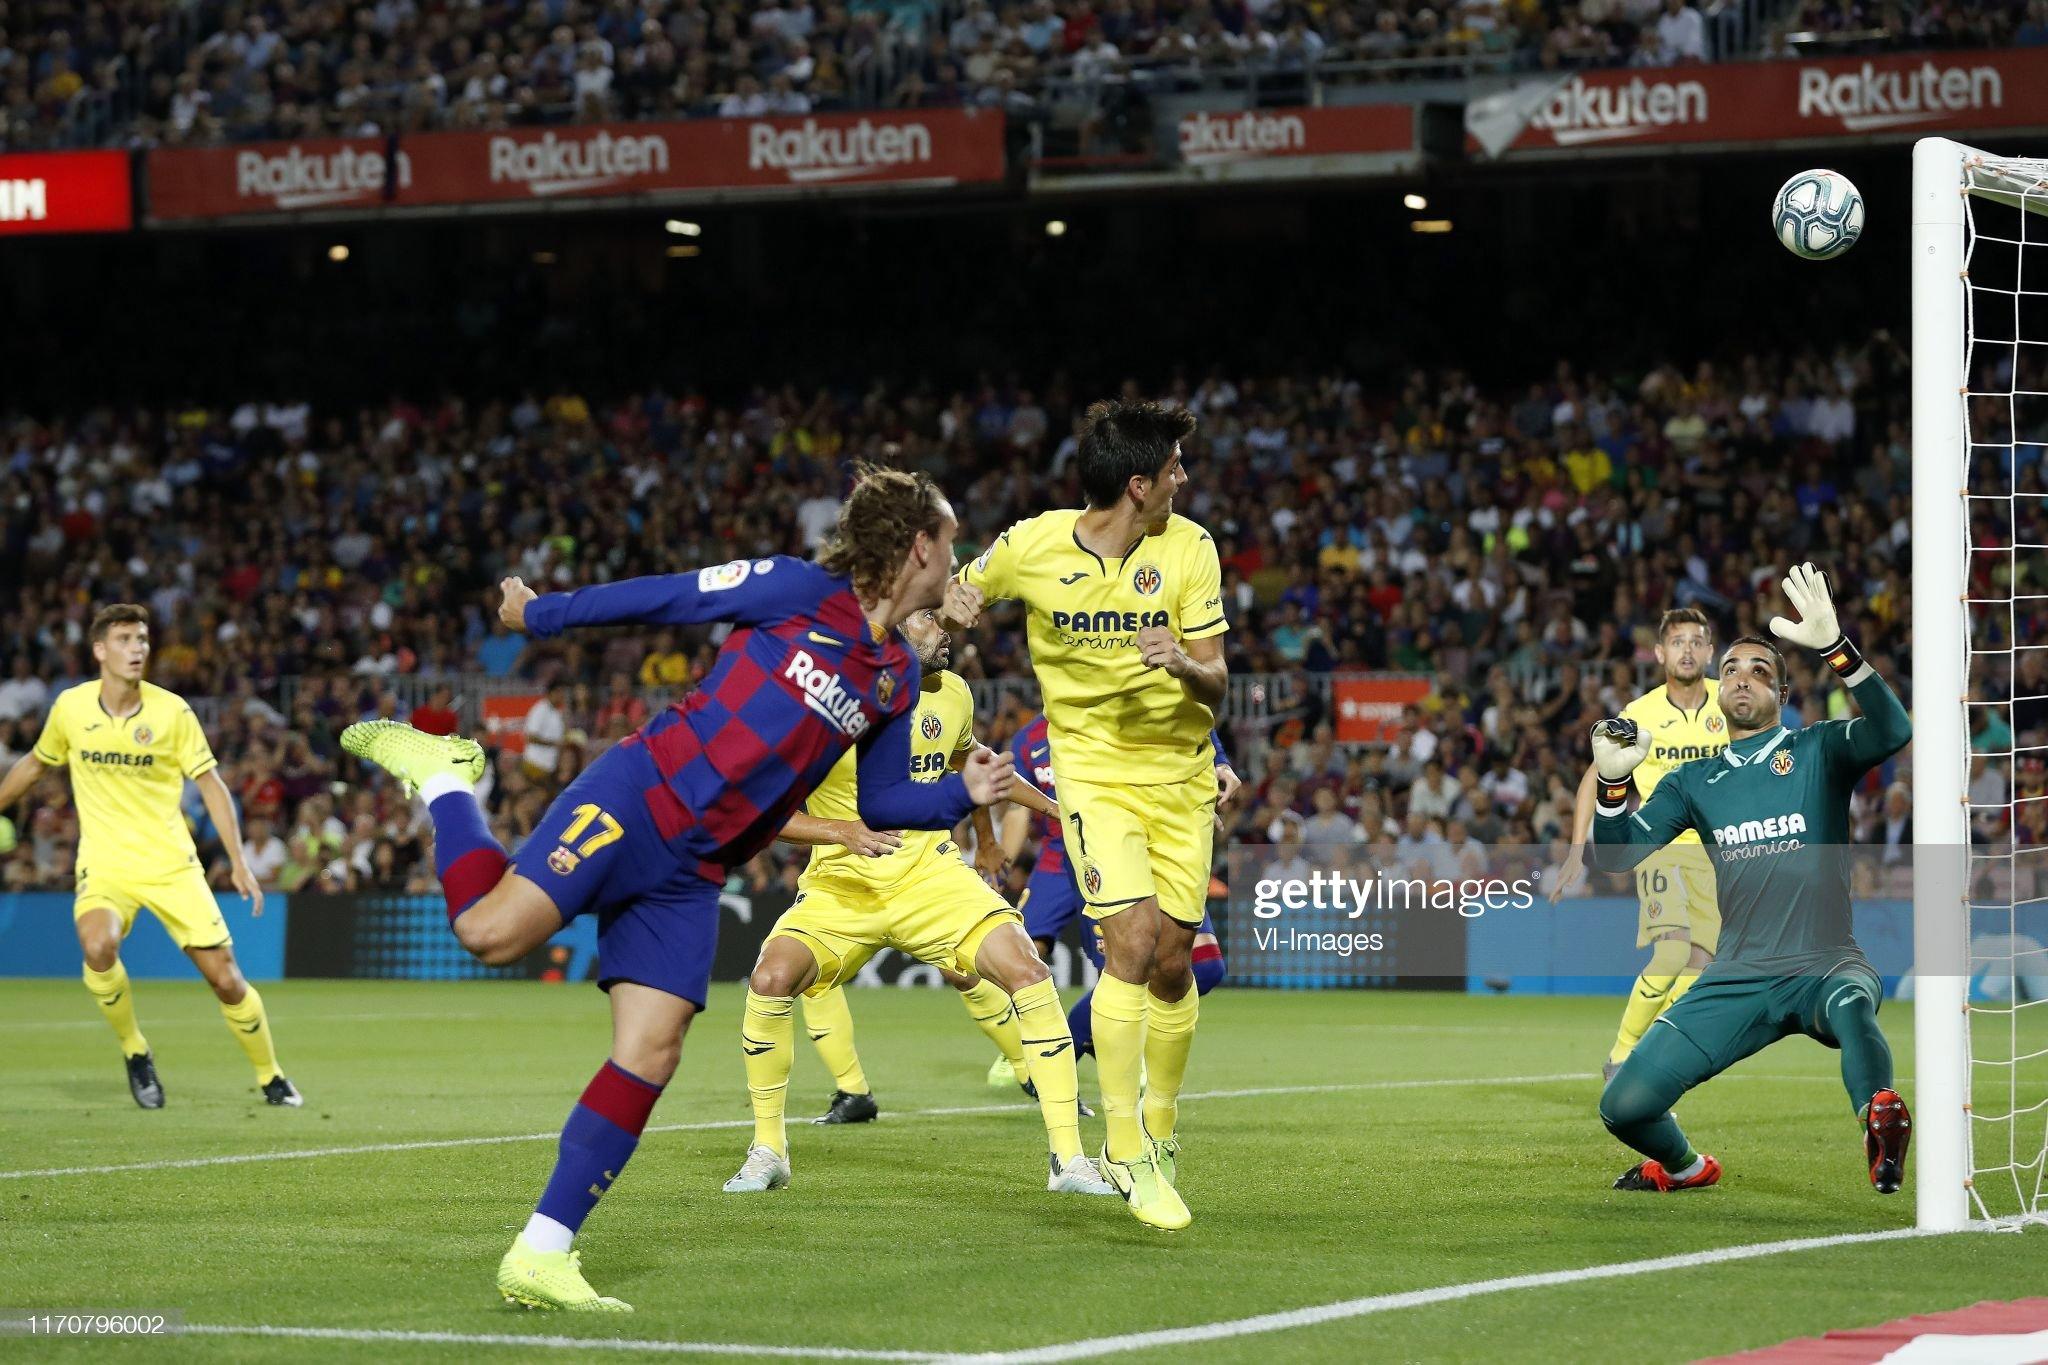 صور مباراة : برشلونة - فياريال 2-1 ( 24-09-2019 )  Antoine-griezmann-of-fc-barcelona-gerard-moreno-of-villarreal-cf-xavi-picture-id1170796002?s=2048x2048